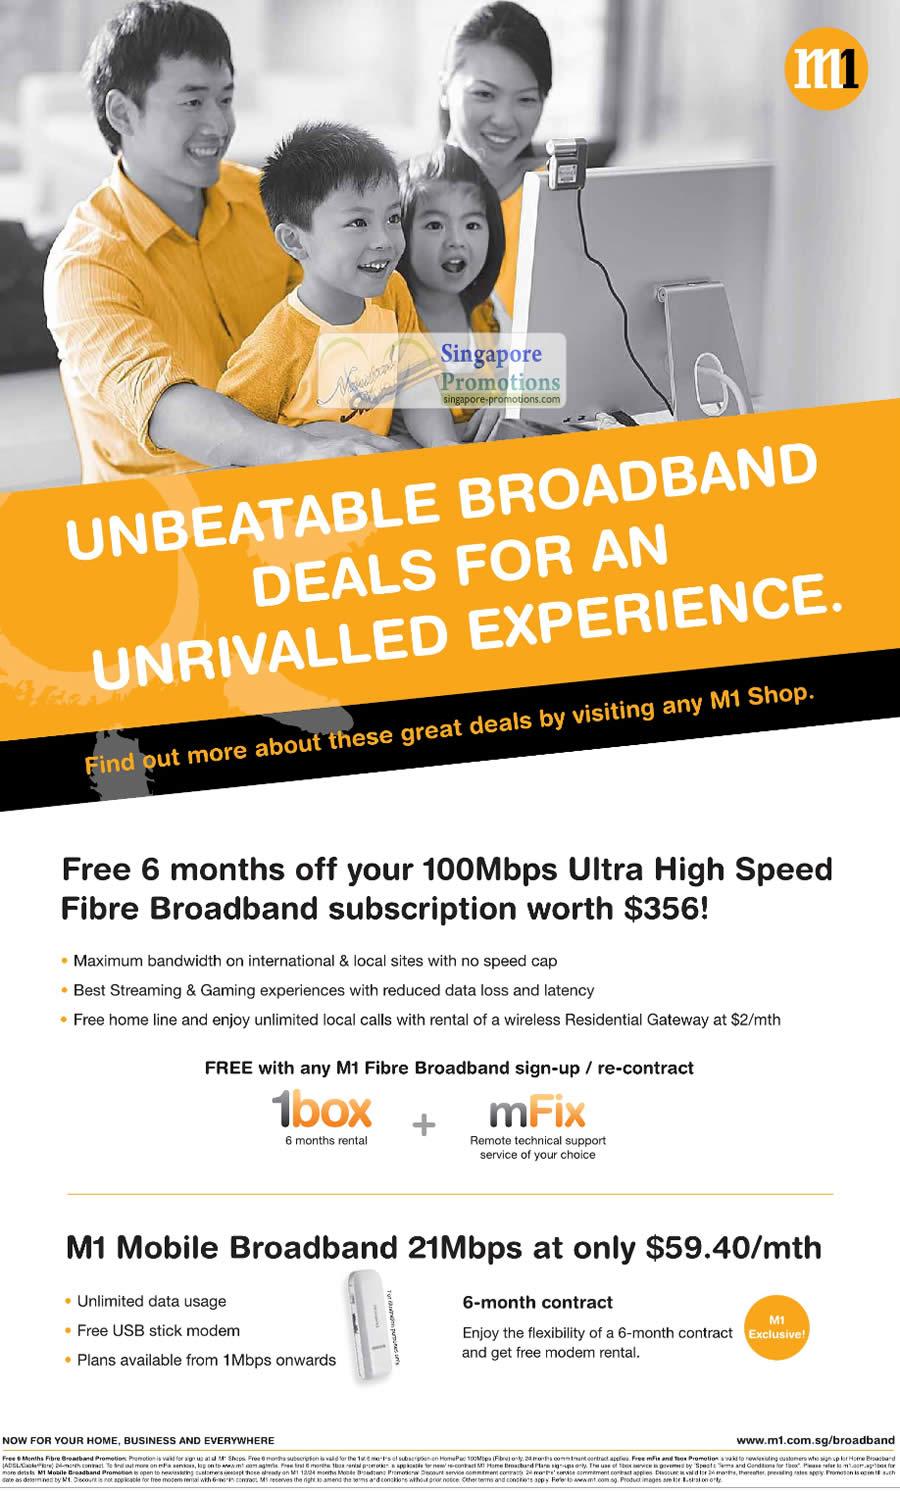 100Mbps Fibre Broadband, Free 6 Months, Mobile Broadband